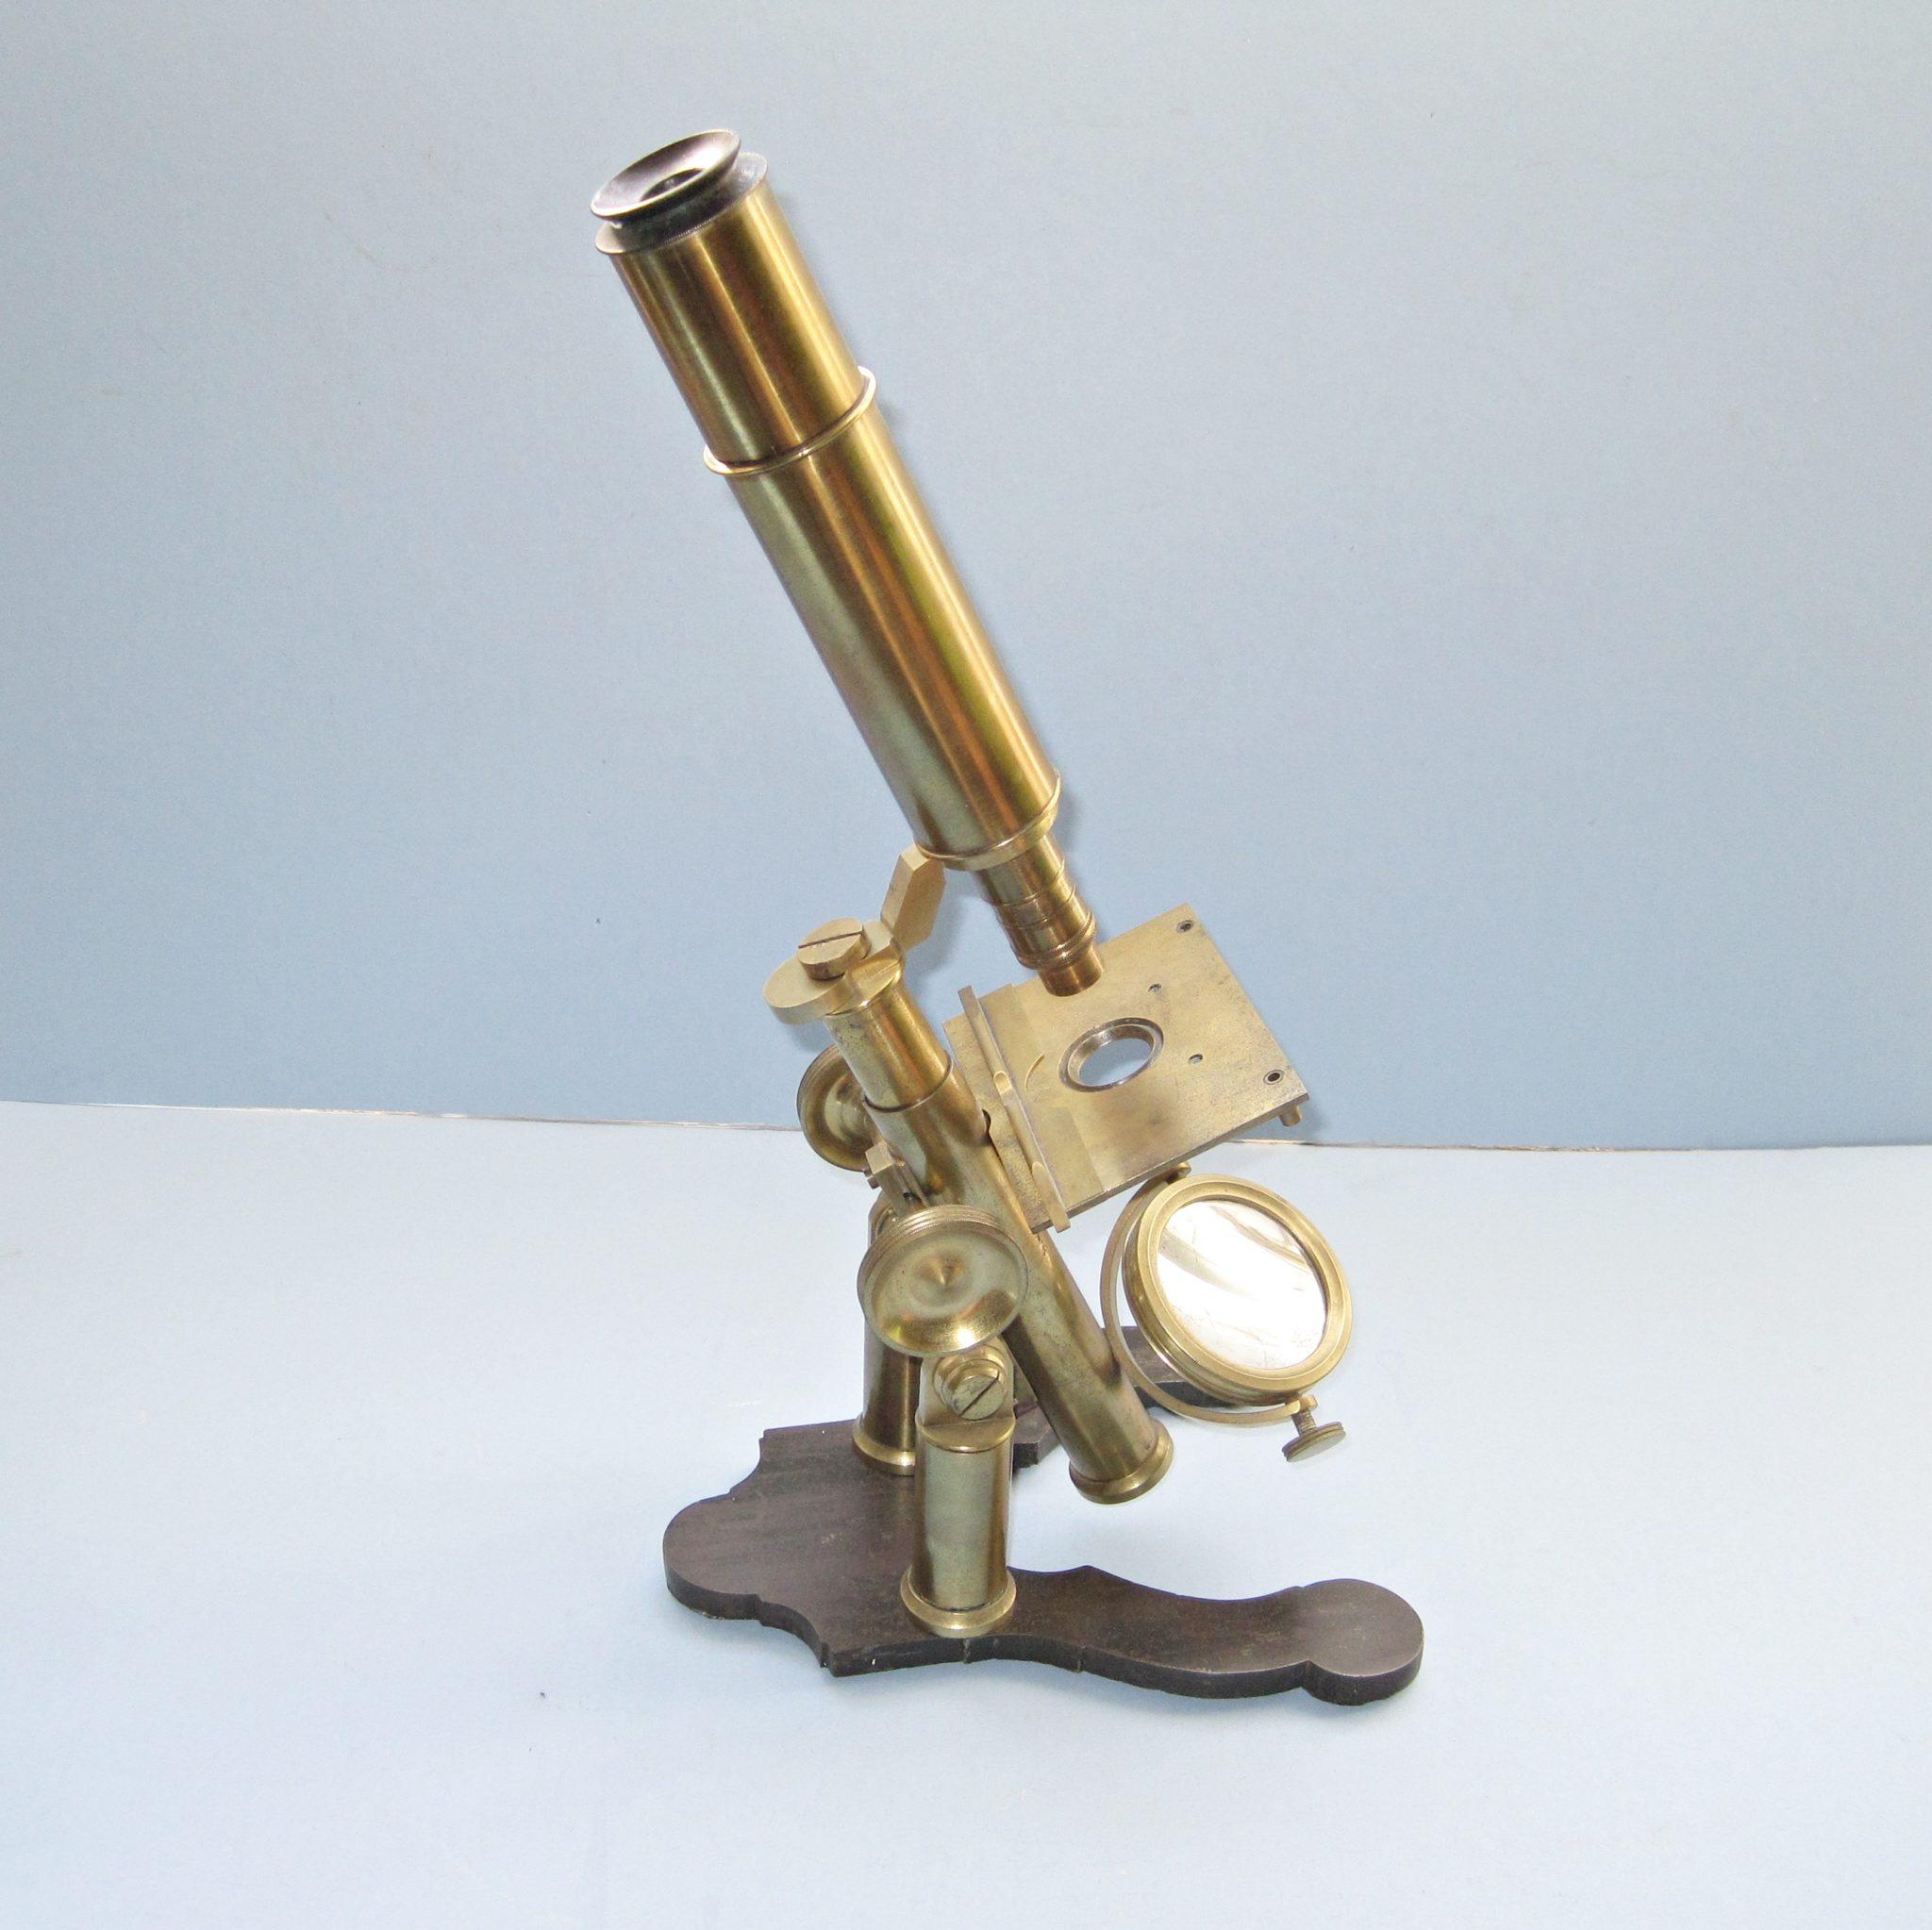 Large, Brass, Double-Pillar Compound-Monocular Microscope, C1870s